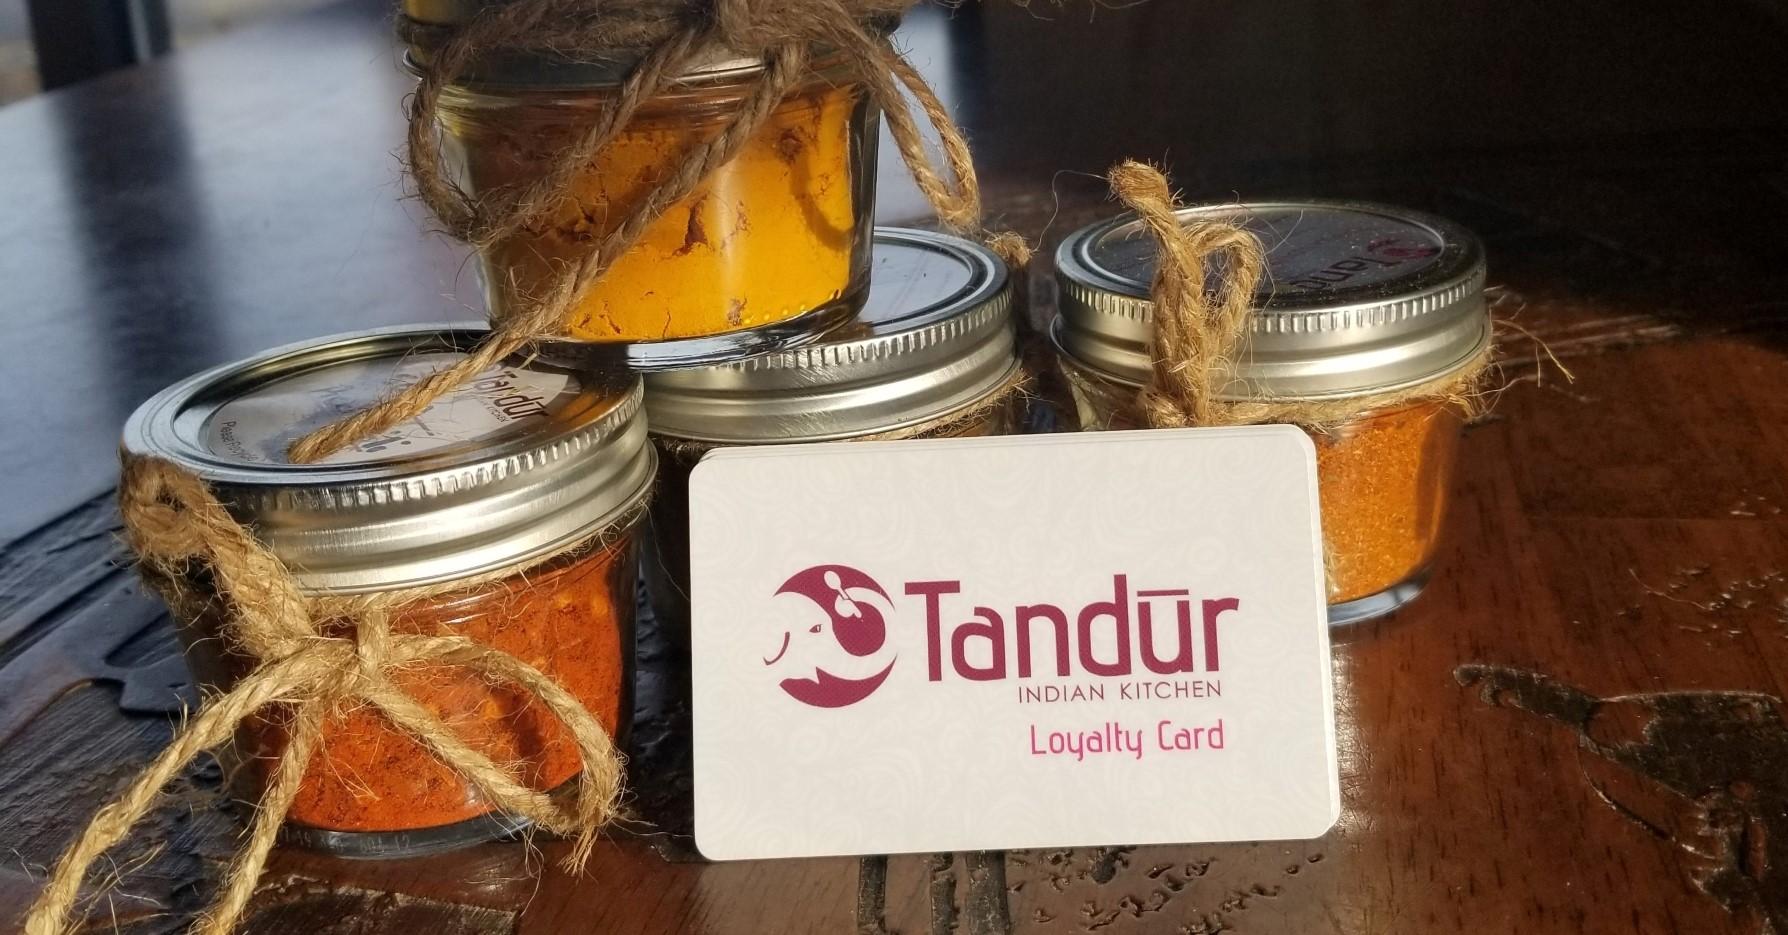 tandur-loyalty-card-desktop-banner-2